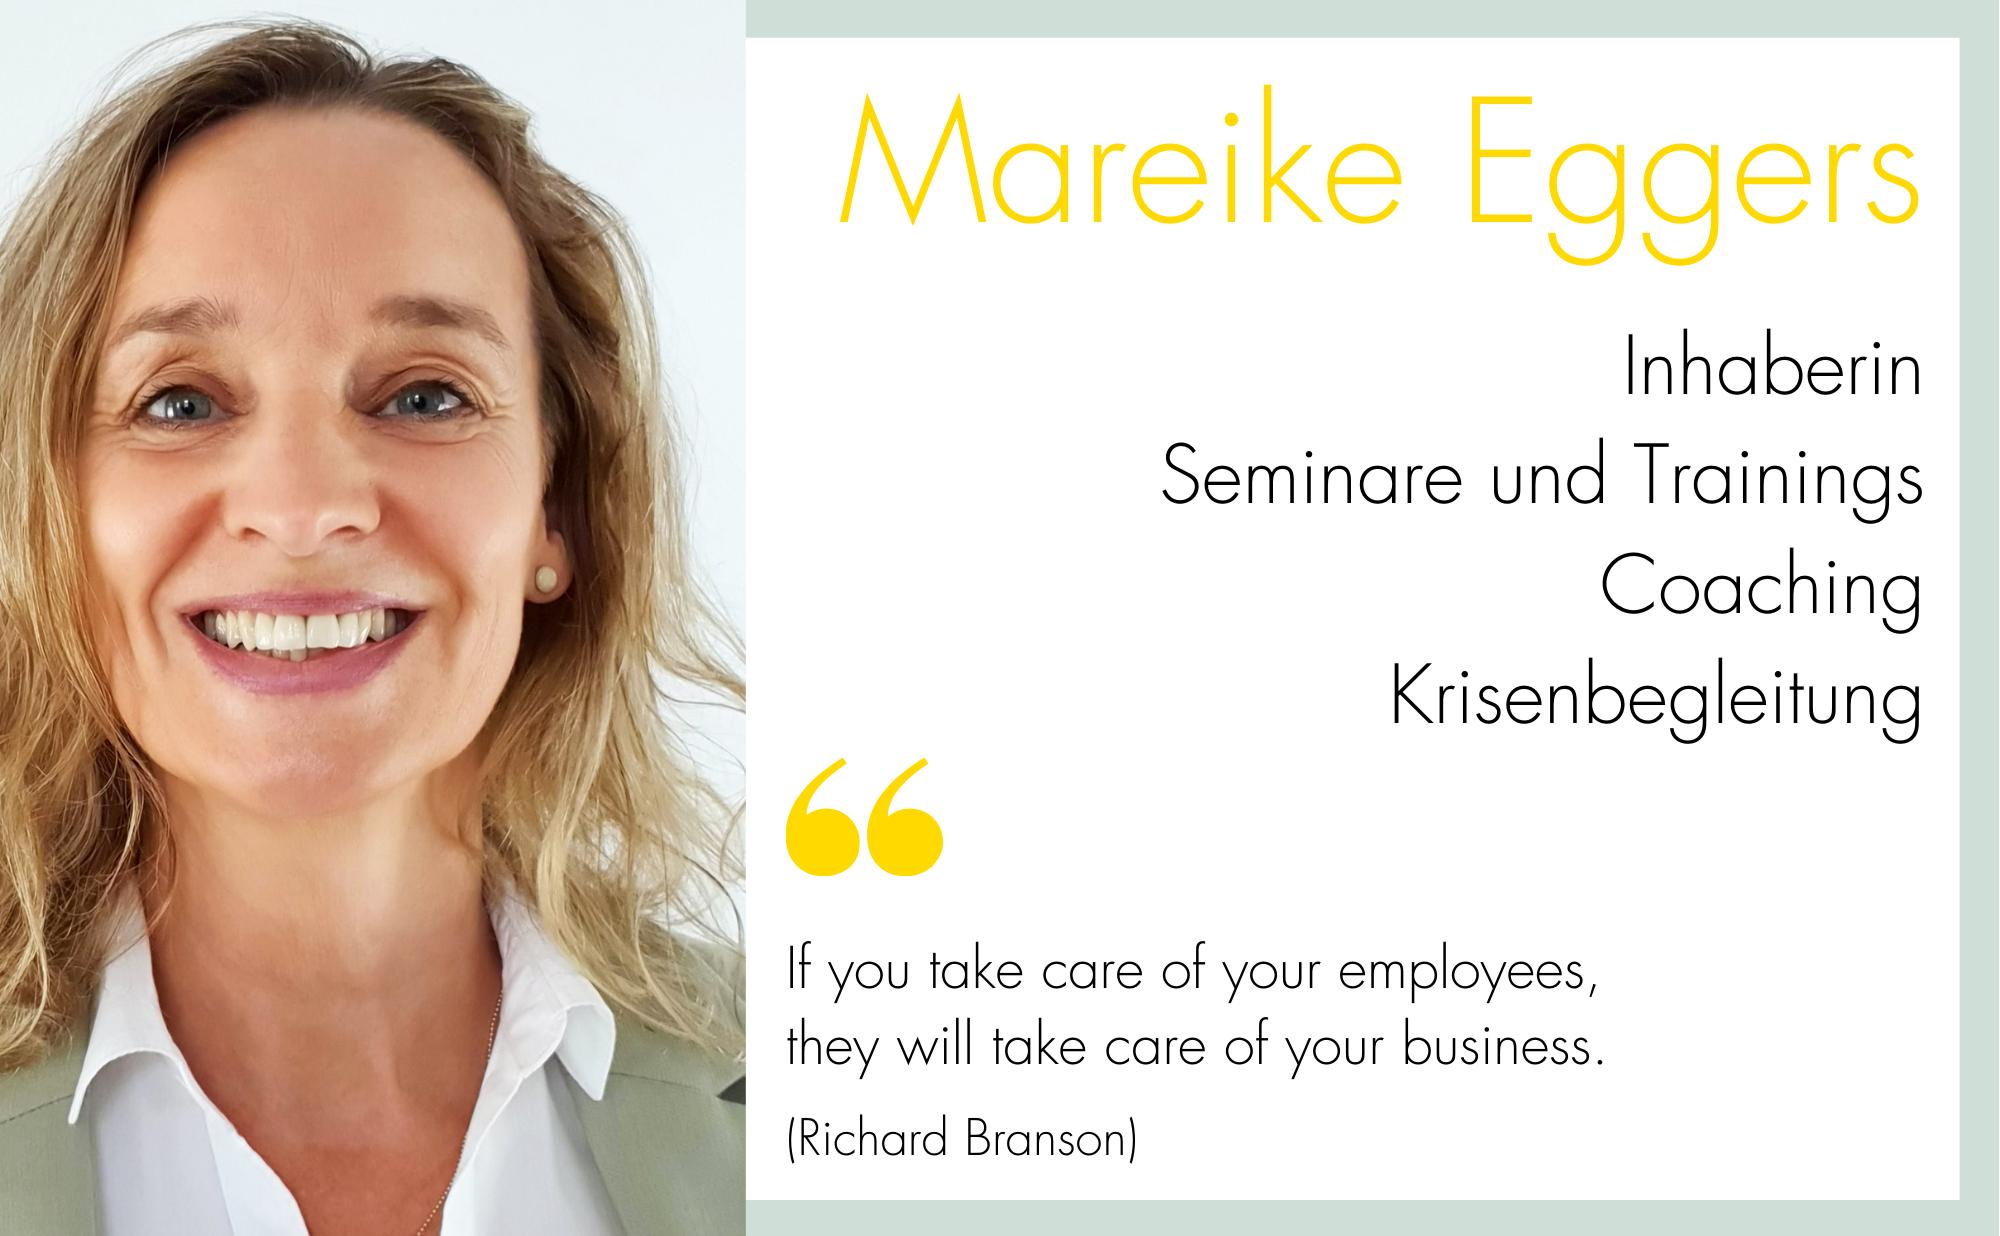 Mareike Eggers